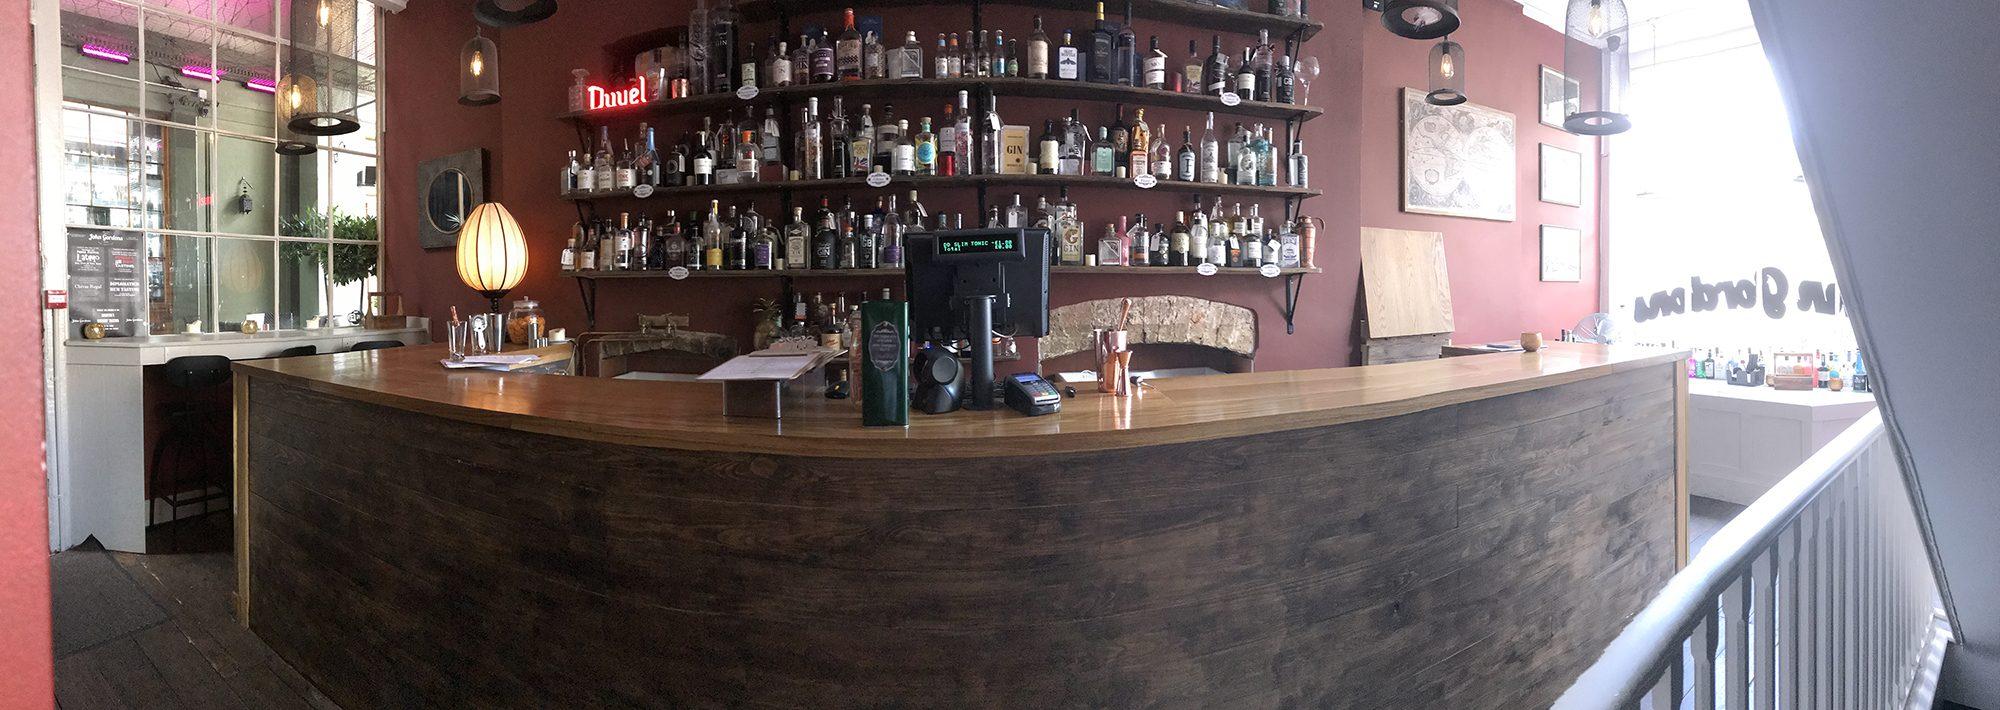 Around the World in 6 Gins at John Gordons Whisky and Wine Bar in Cheltenham